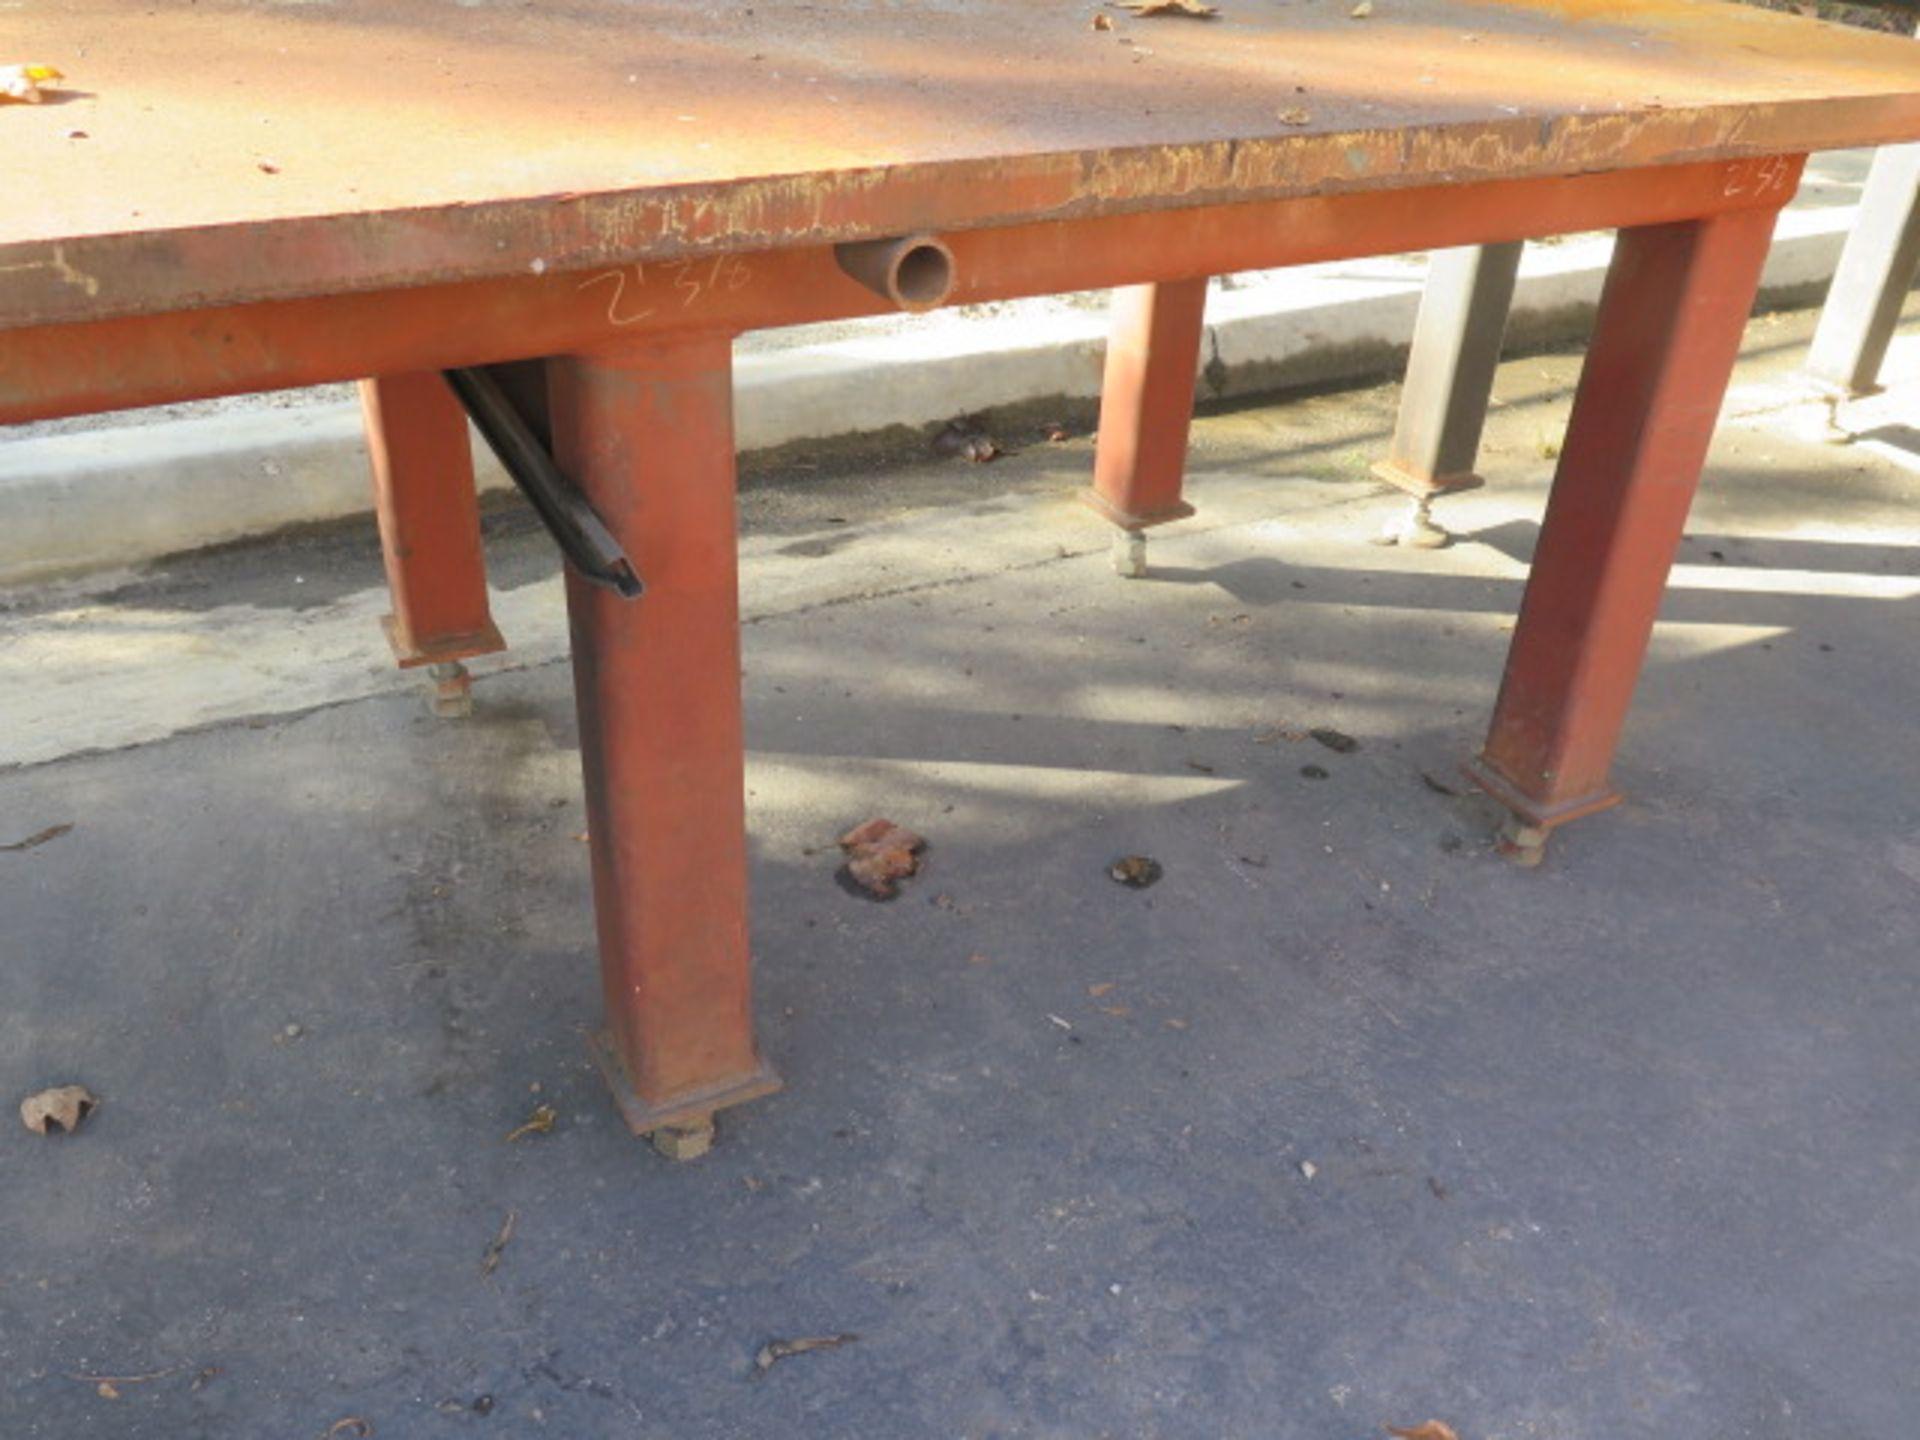 "4' x 8' x 1 1/2"" Steel Welding Table (SOLD AS-IS - NO WARRANTY) - Image 5 of 5"